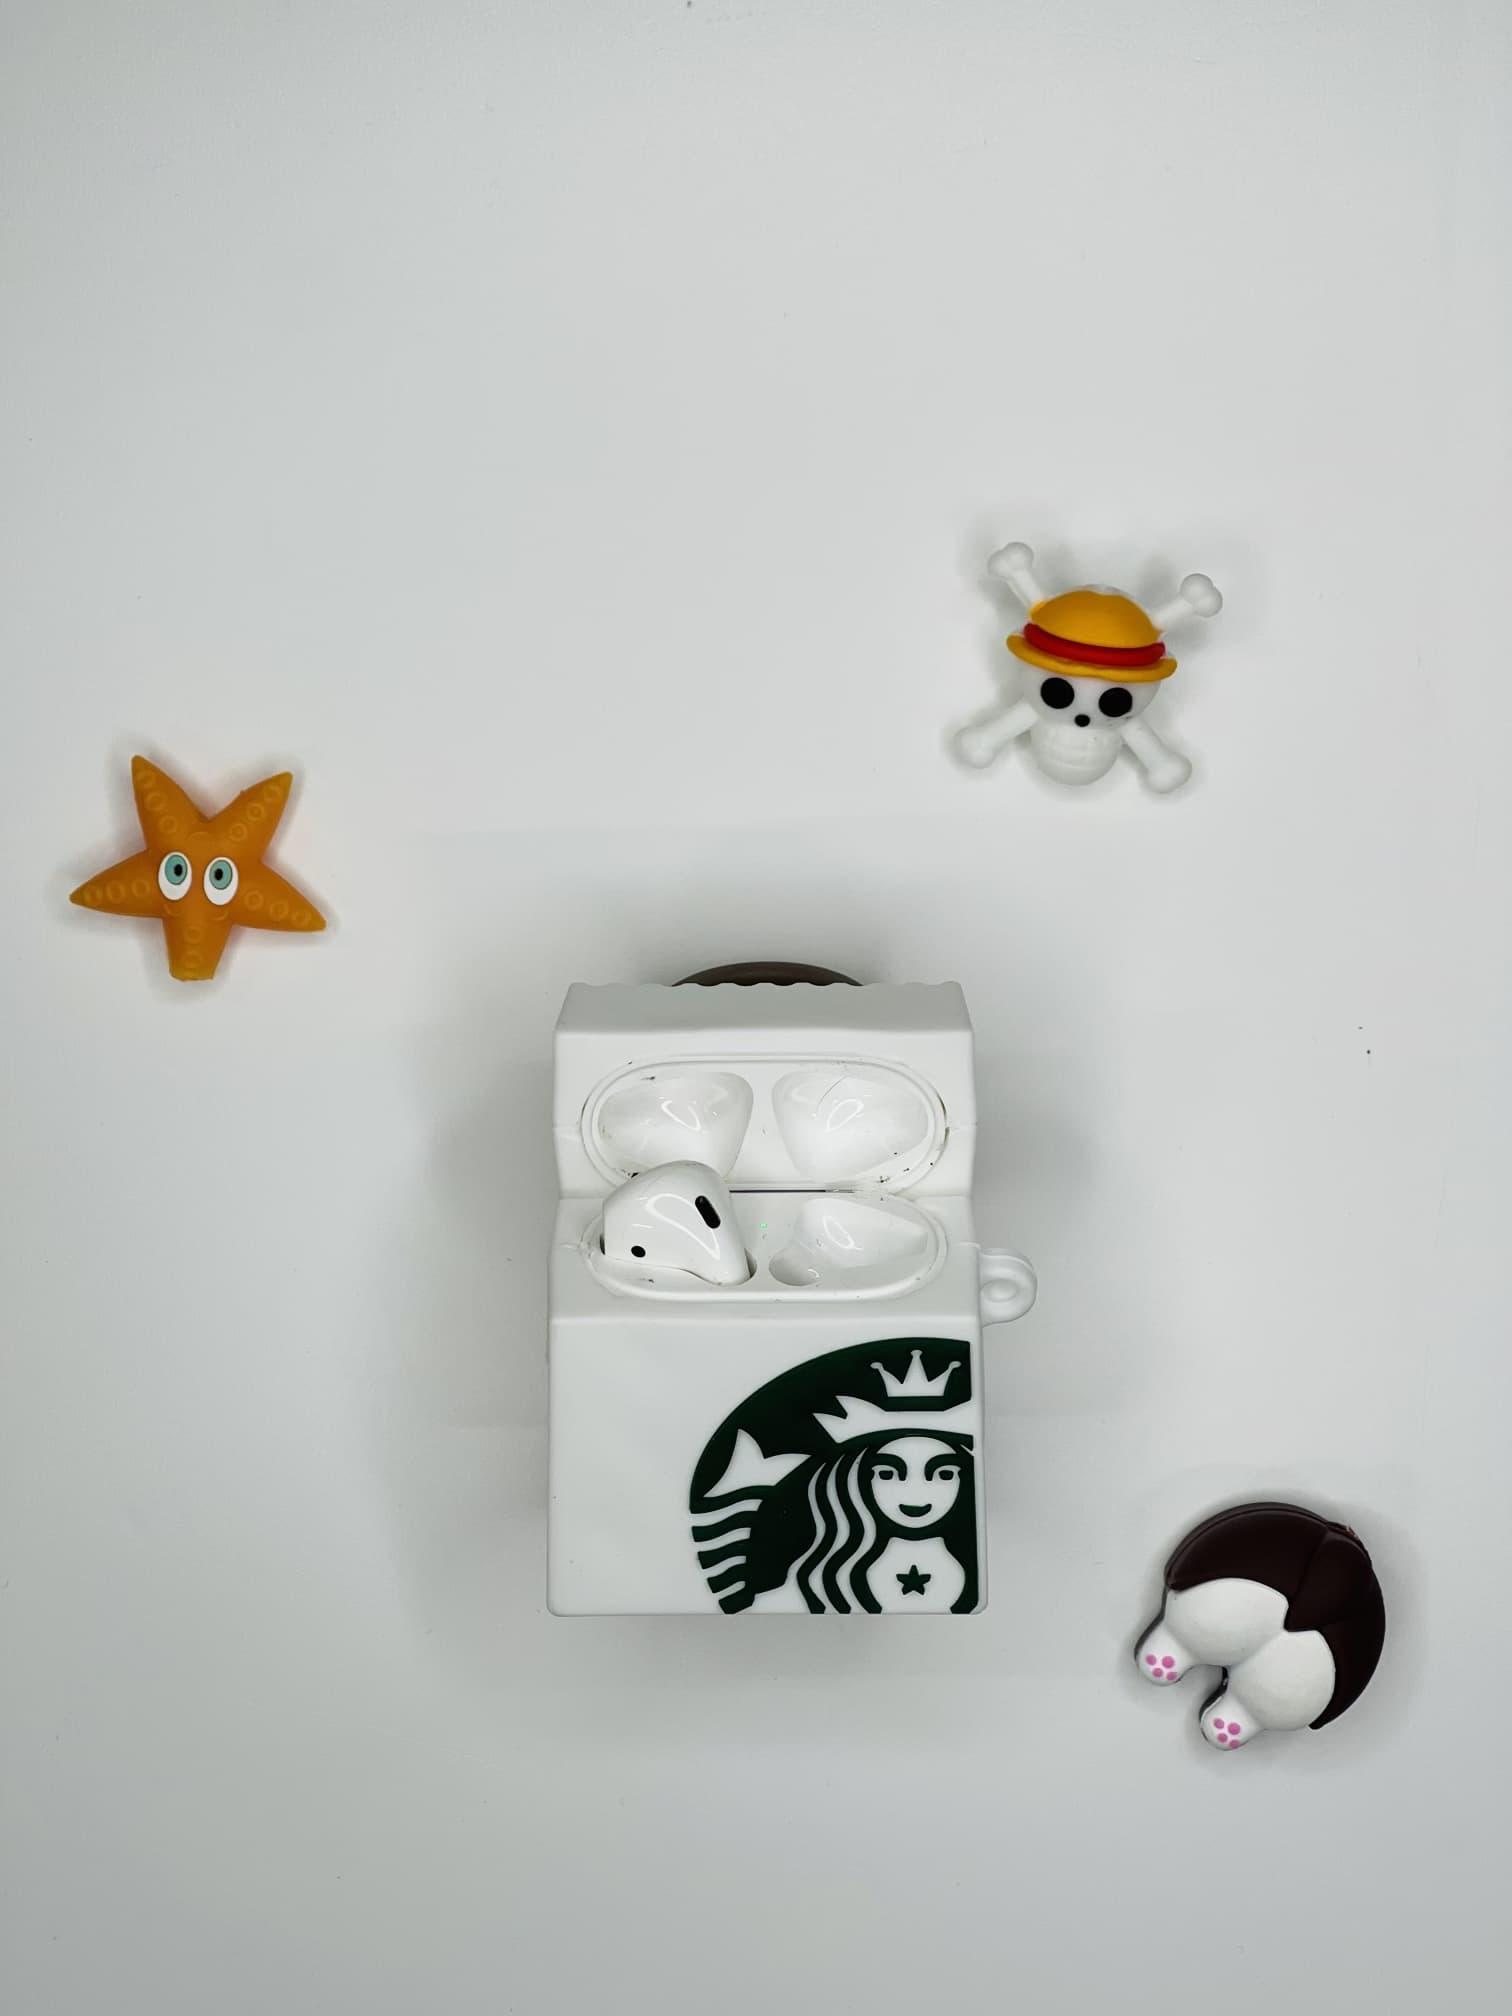 Starbucks Çanta Figürlü AirPods 2 Kılıfı